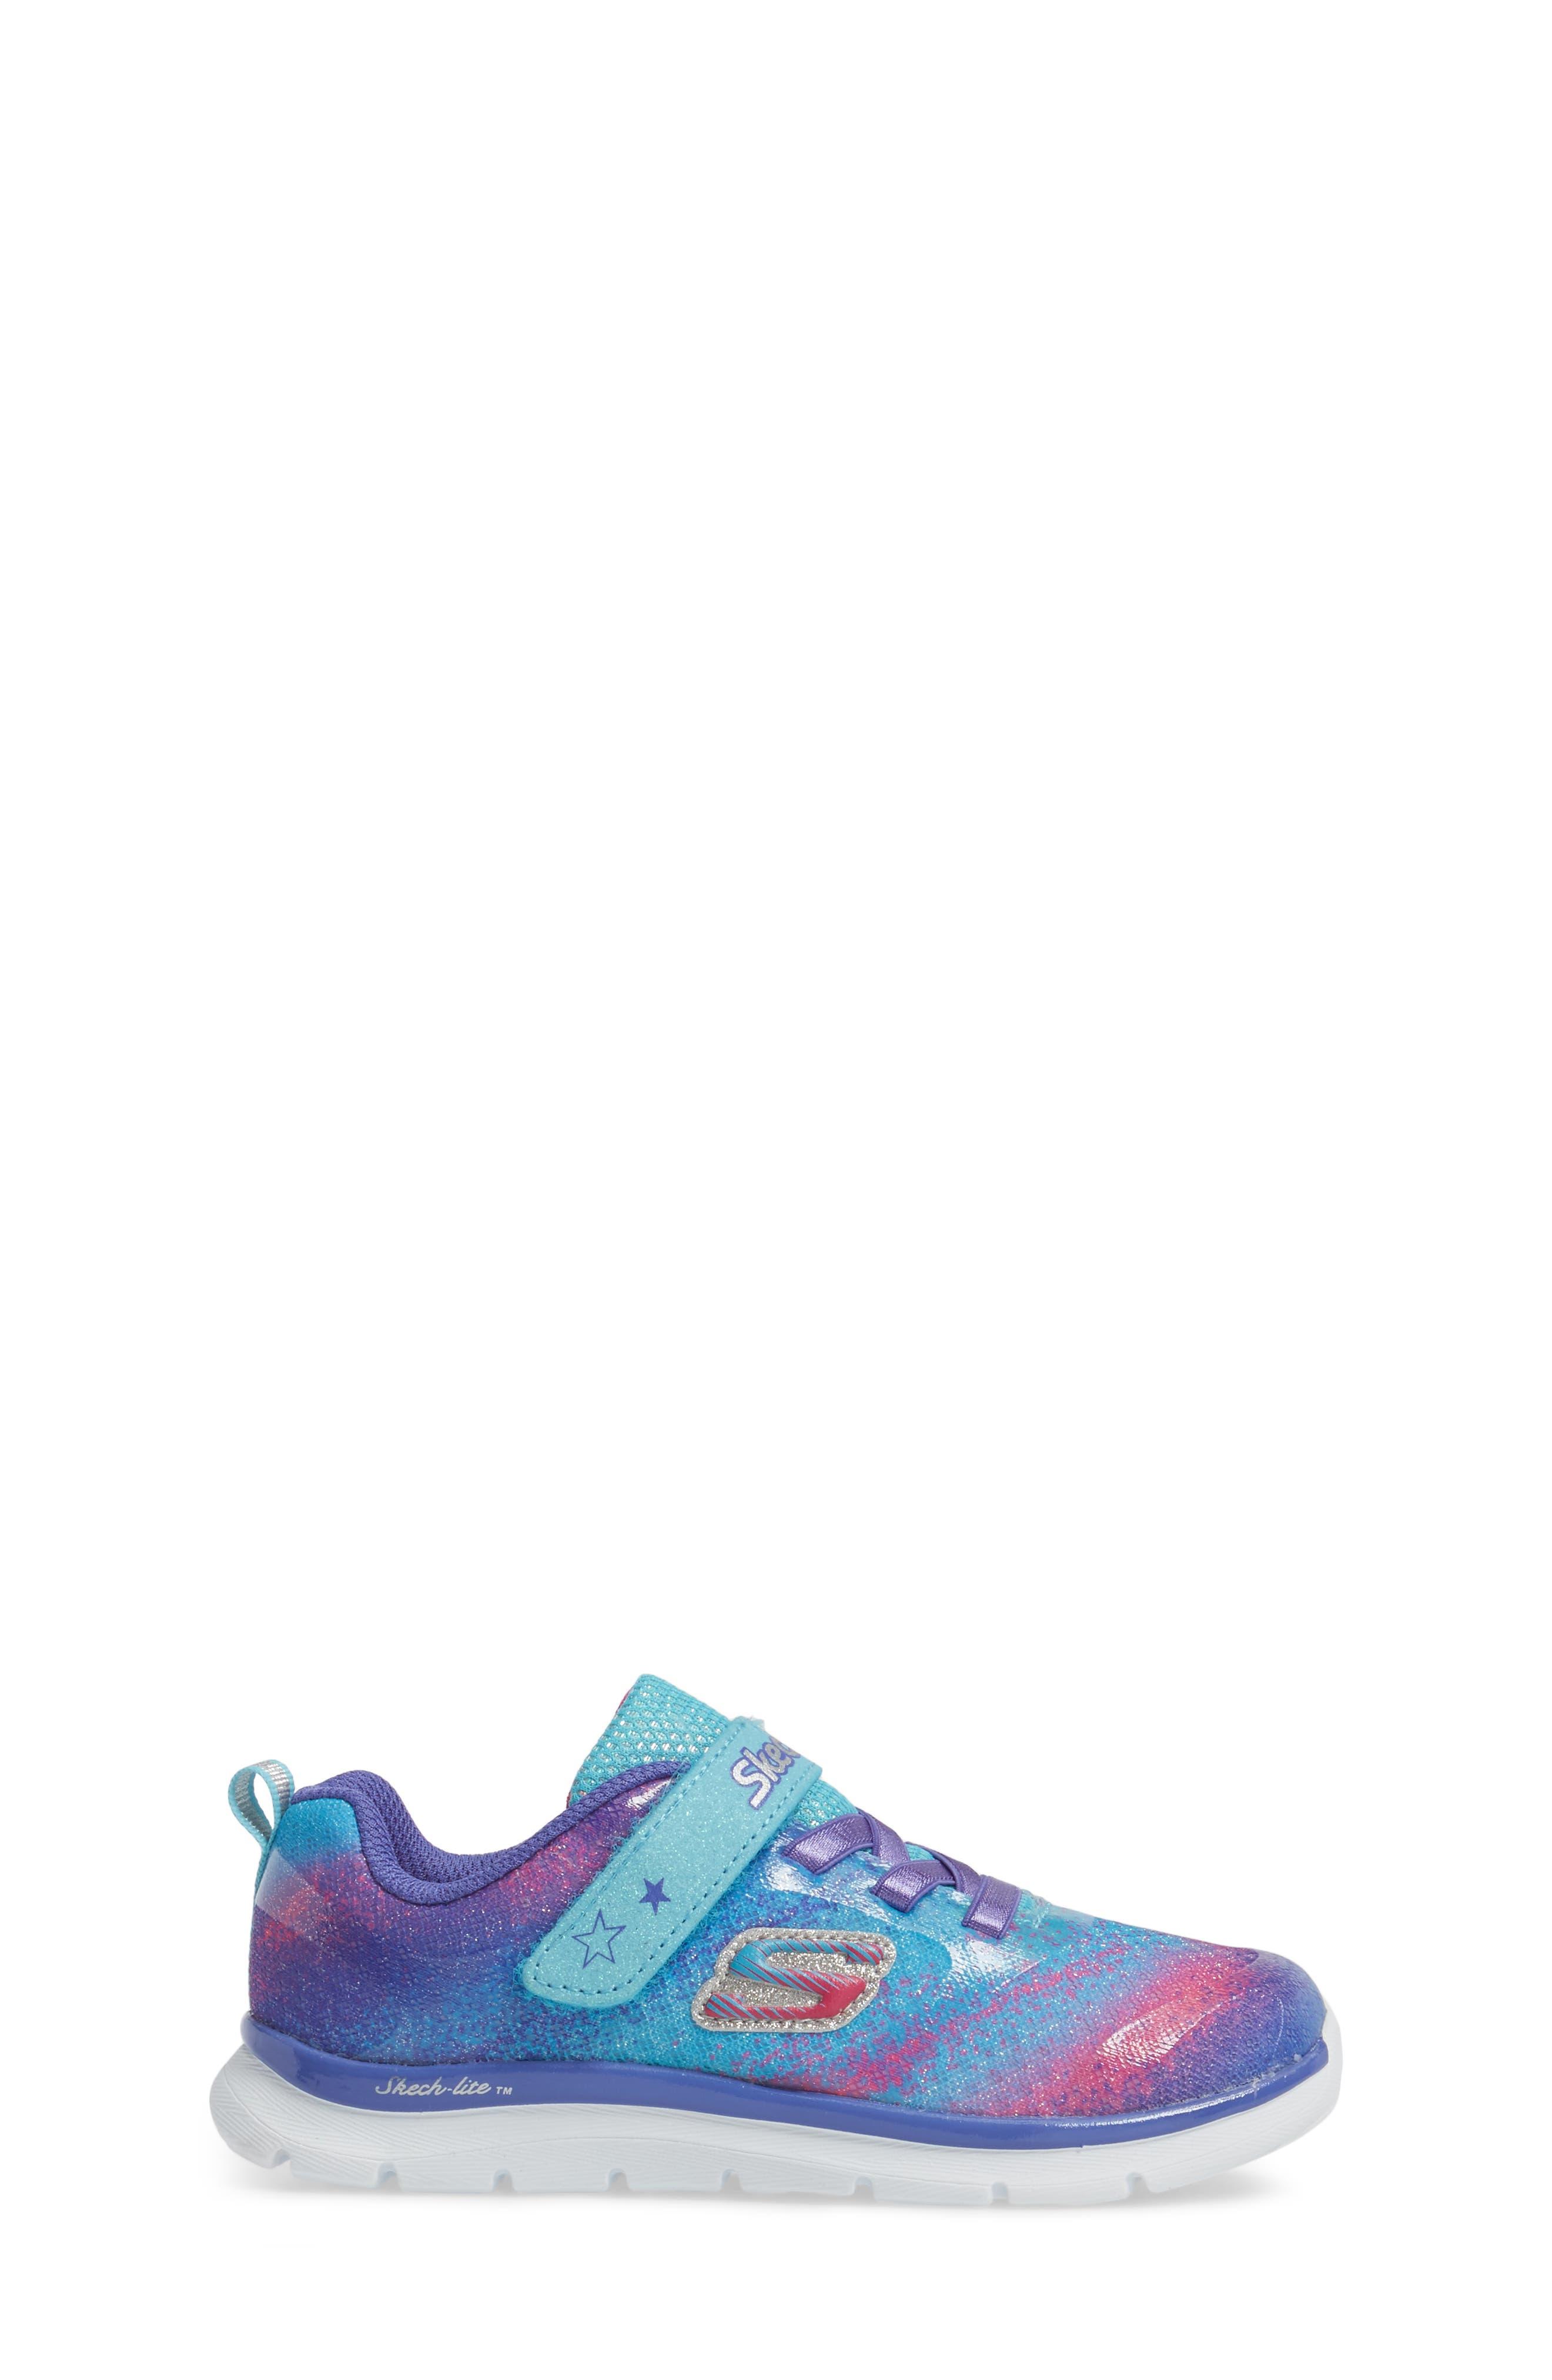 Alternate Image 3  - SKECHERS Skech-Lite Colorful Cutie Sneaker (Walker & Toddler)